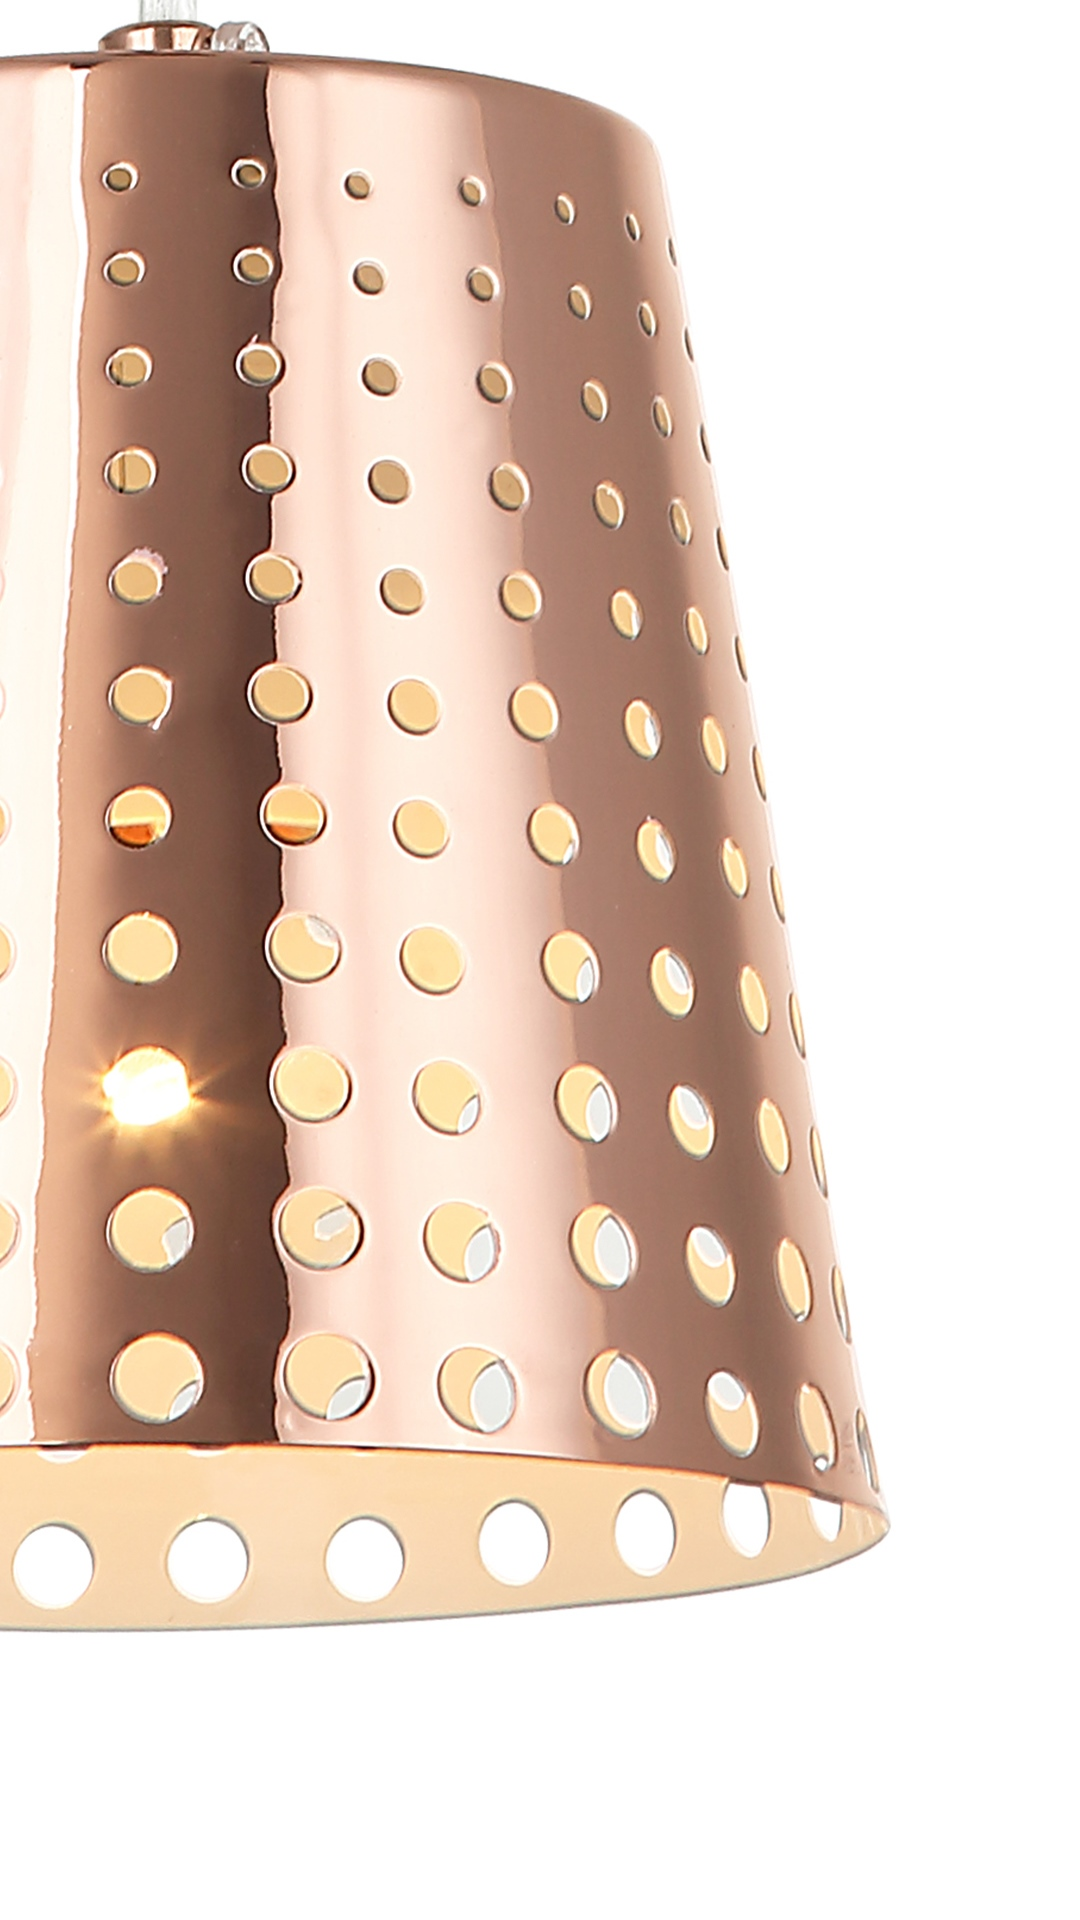 Lampenlux Hängeleuchte Garcia Pendellampe 40W E27